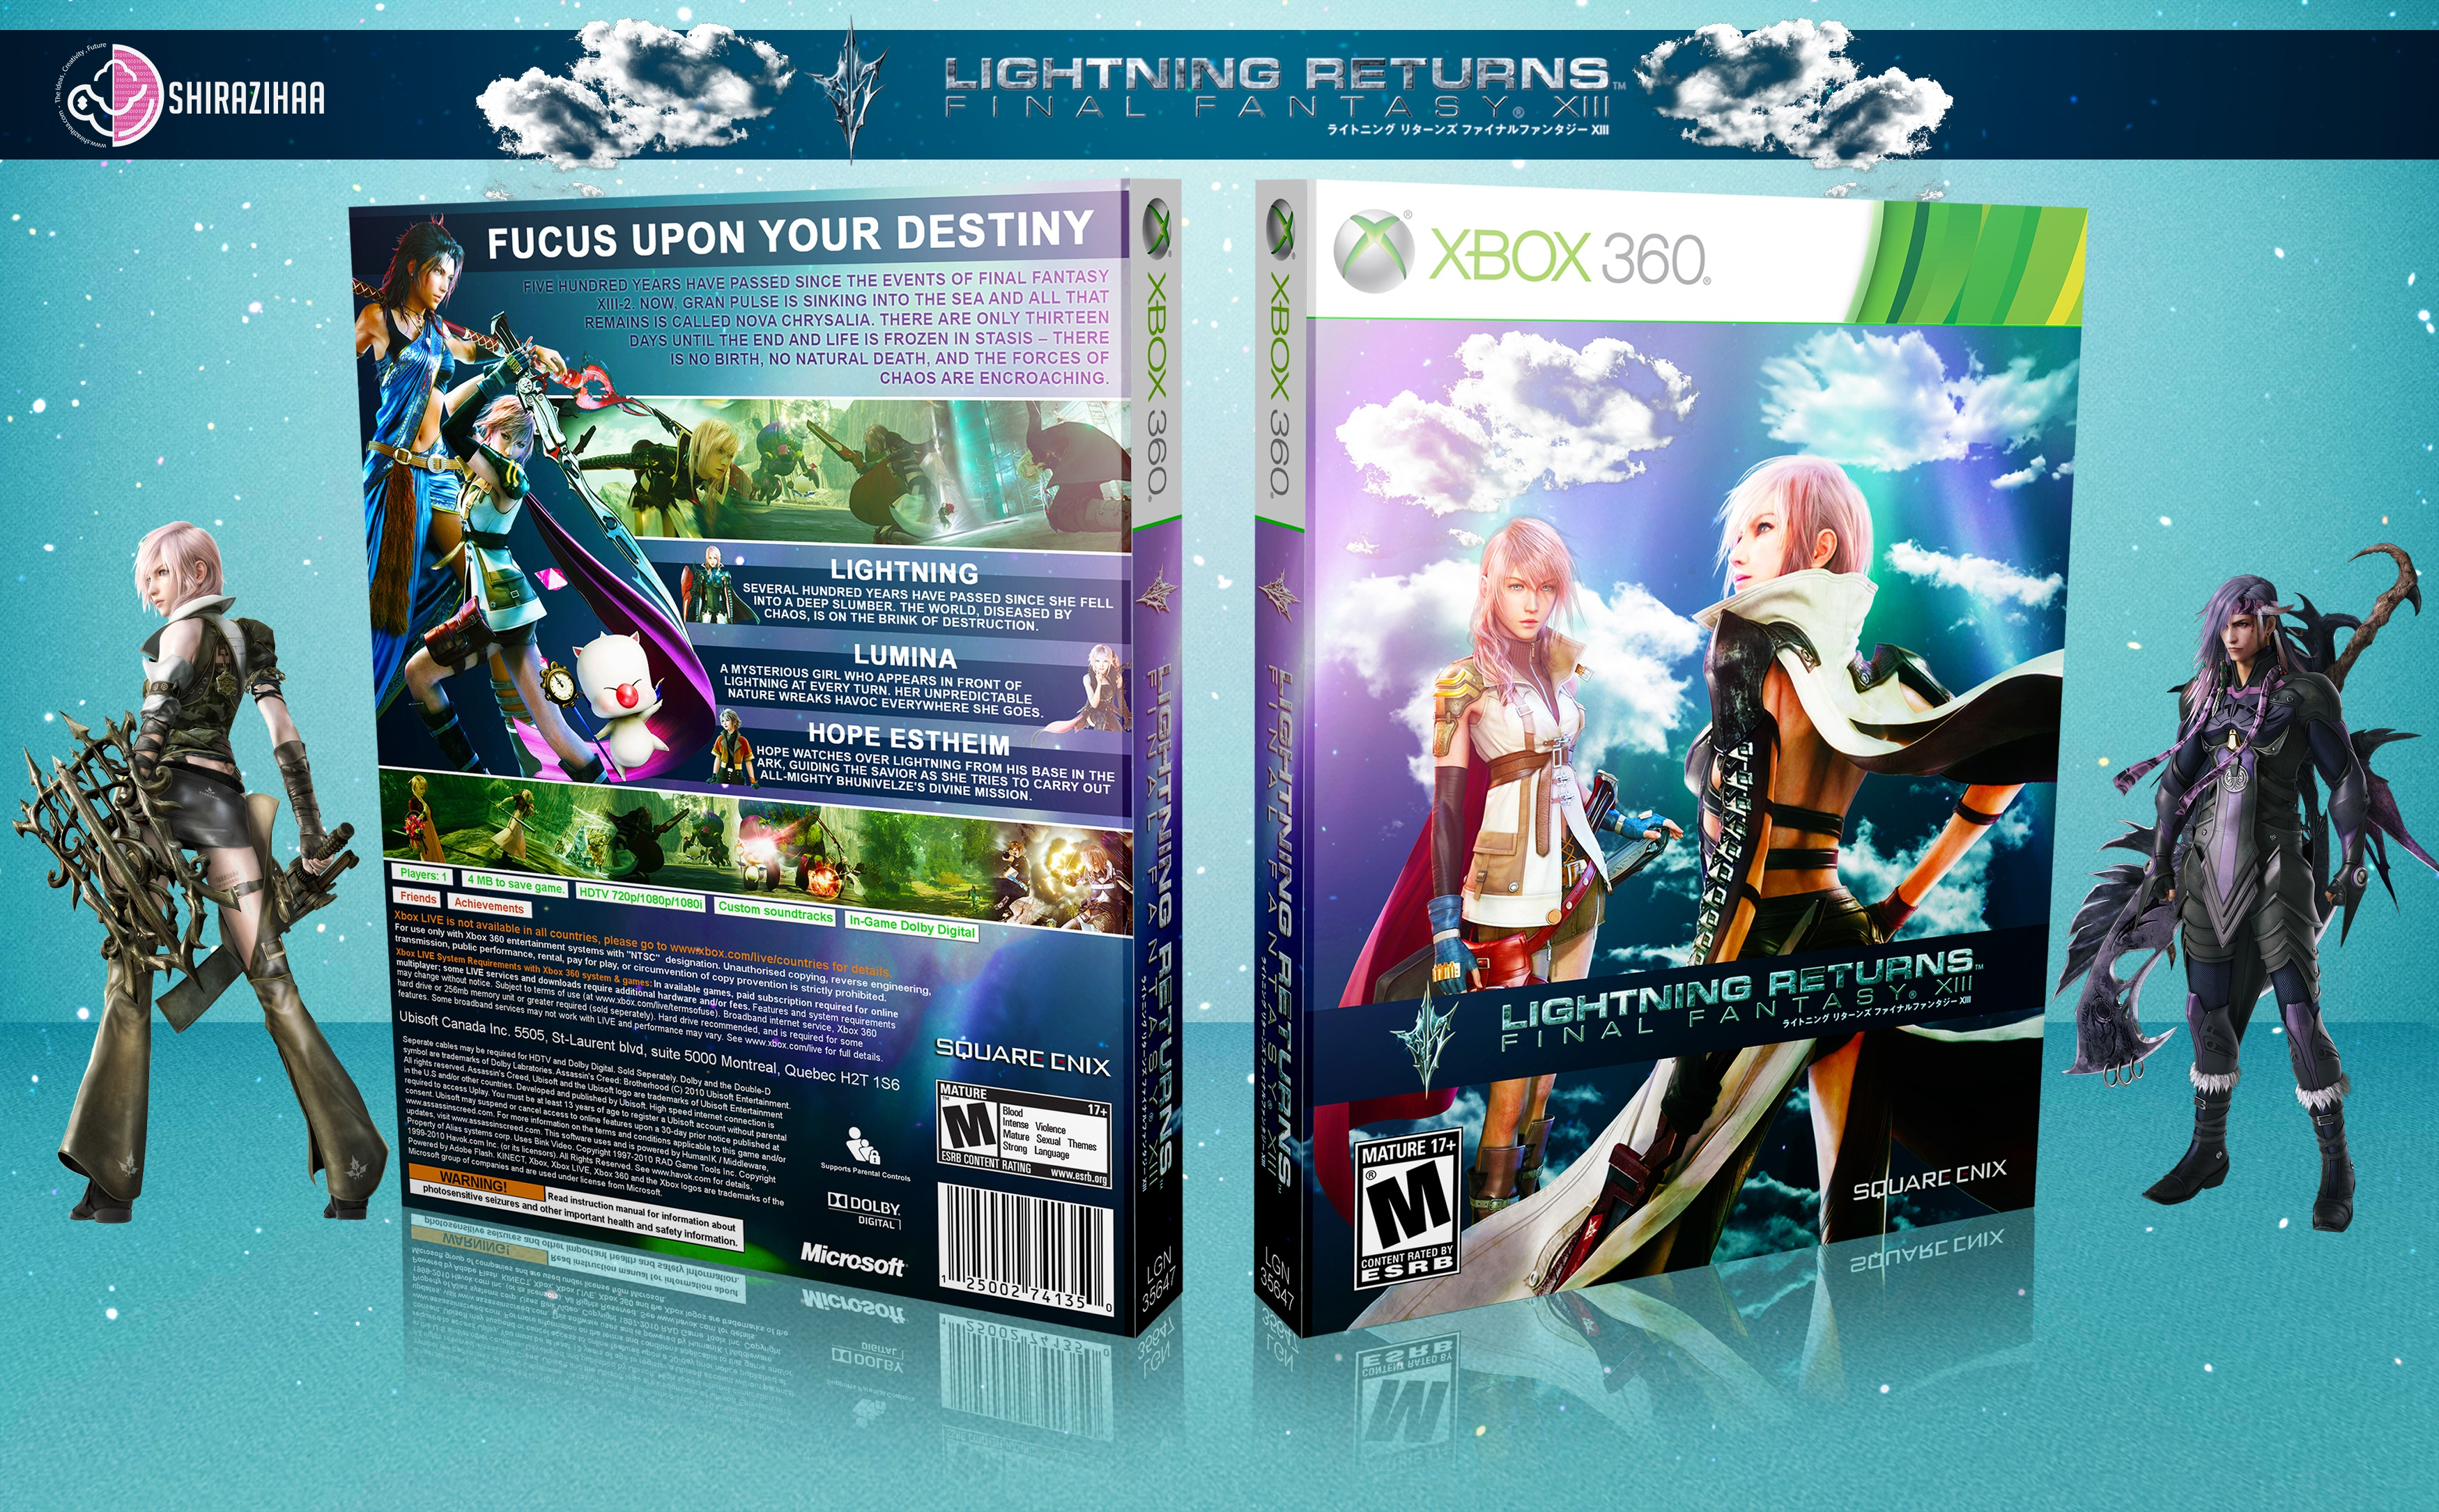 Lightning Returns FINAL FANTASY XIII Xbox 360 Box Art Cover By Shirazihaa